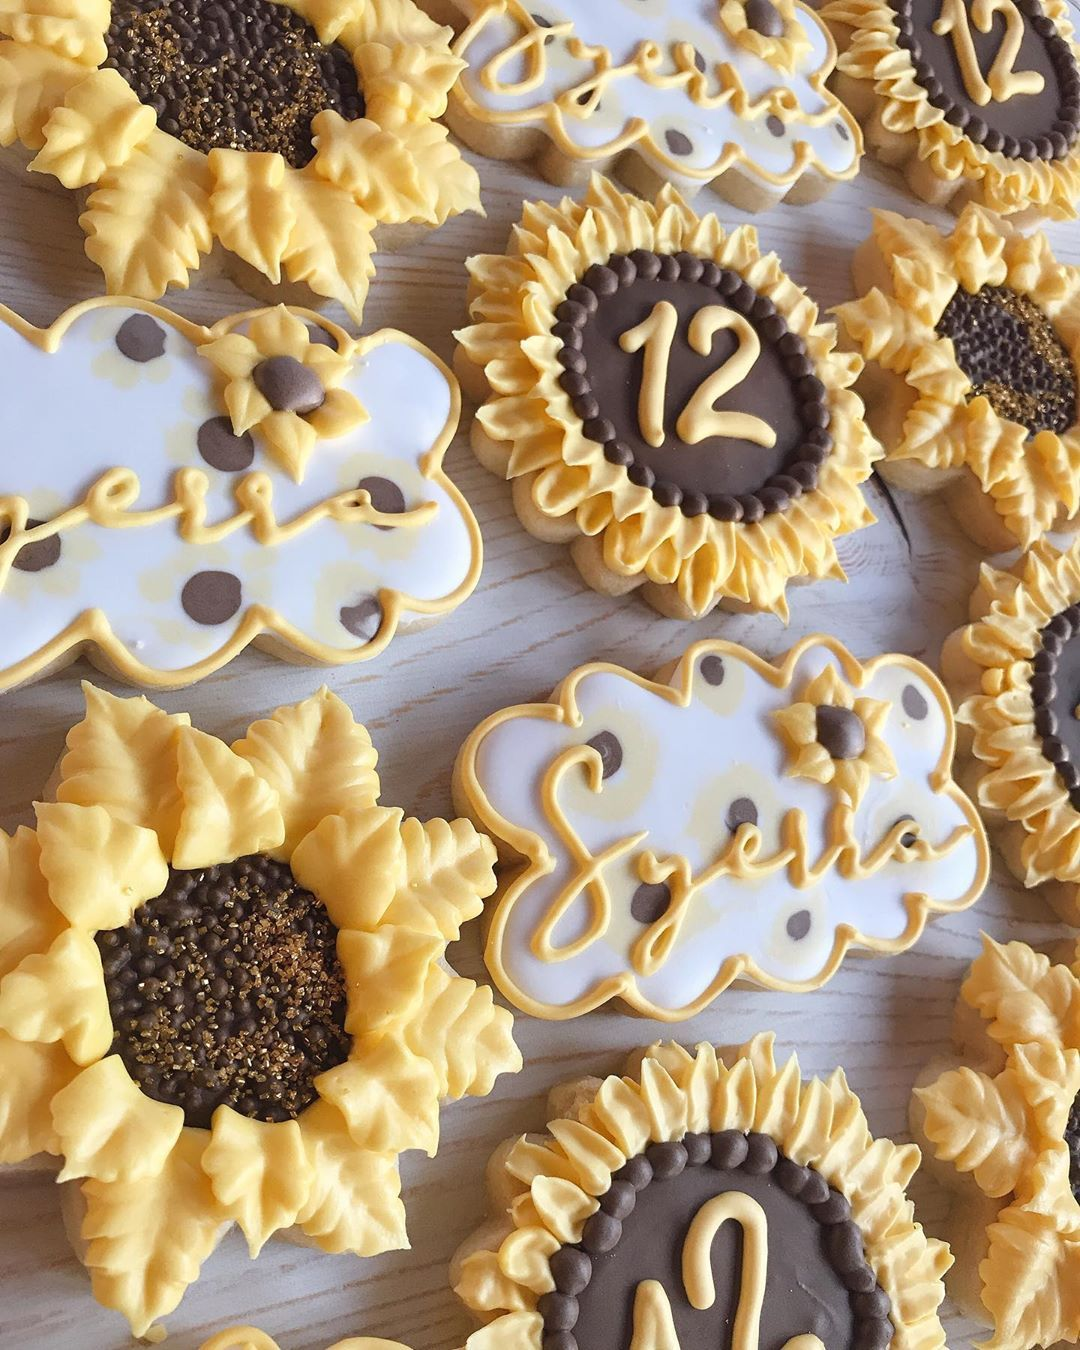 "Gimme Sugars Cookies on Instagram: ""🌻 🌻 🌻 . . . #sunflowercookies #sunflower #cookies #sugarcookies #decoratedsugarcookies #decoratedcookies #cookieart #cookieartist…"""